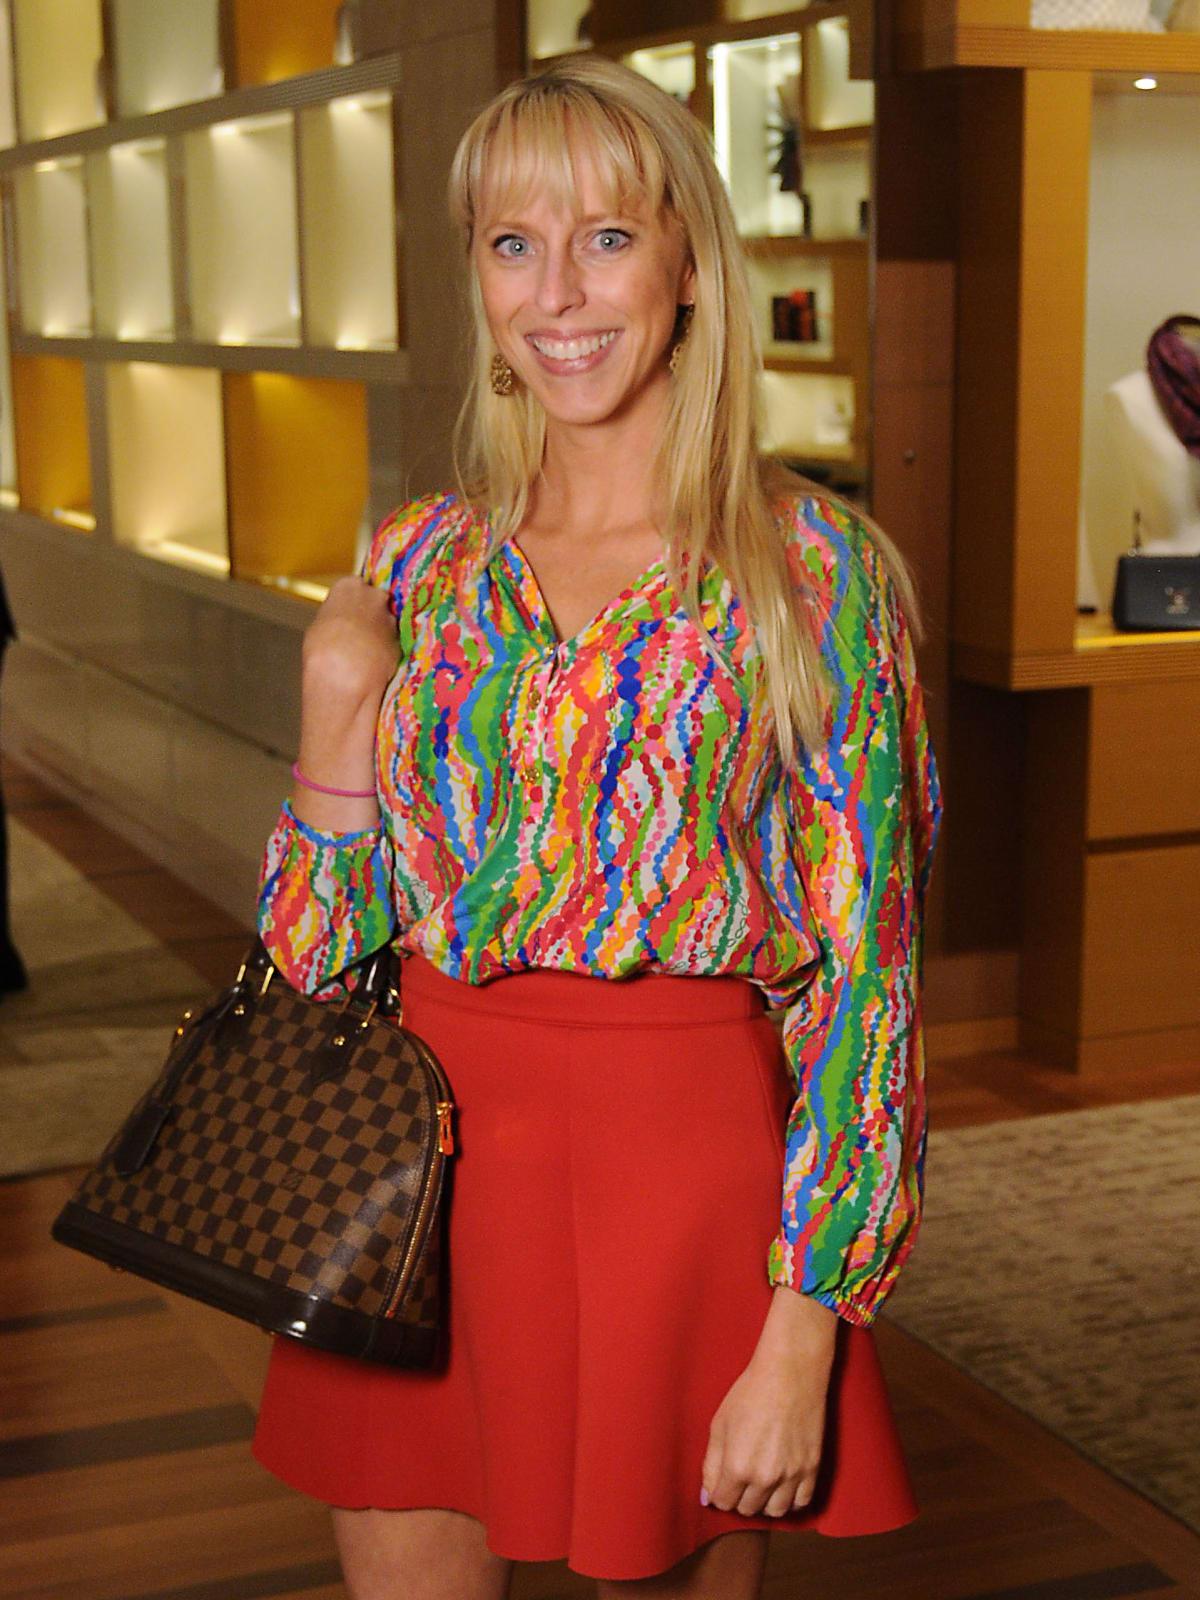 Houston, Louis Vuitton Alley Theatre Salute, September 2015, Lauren Swenson